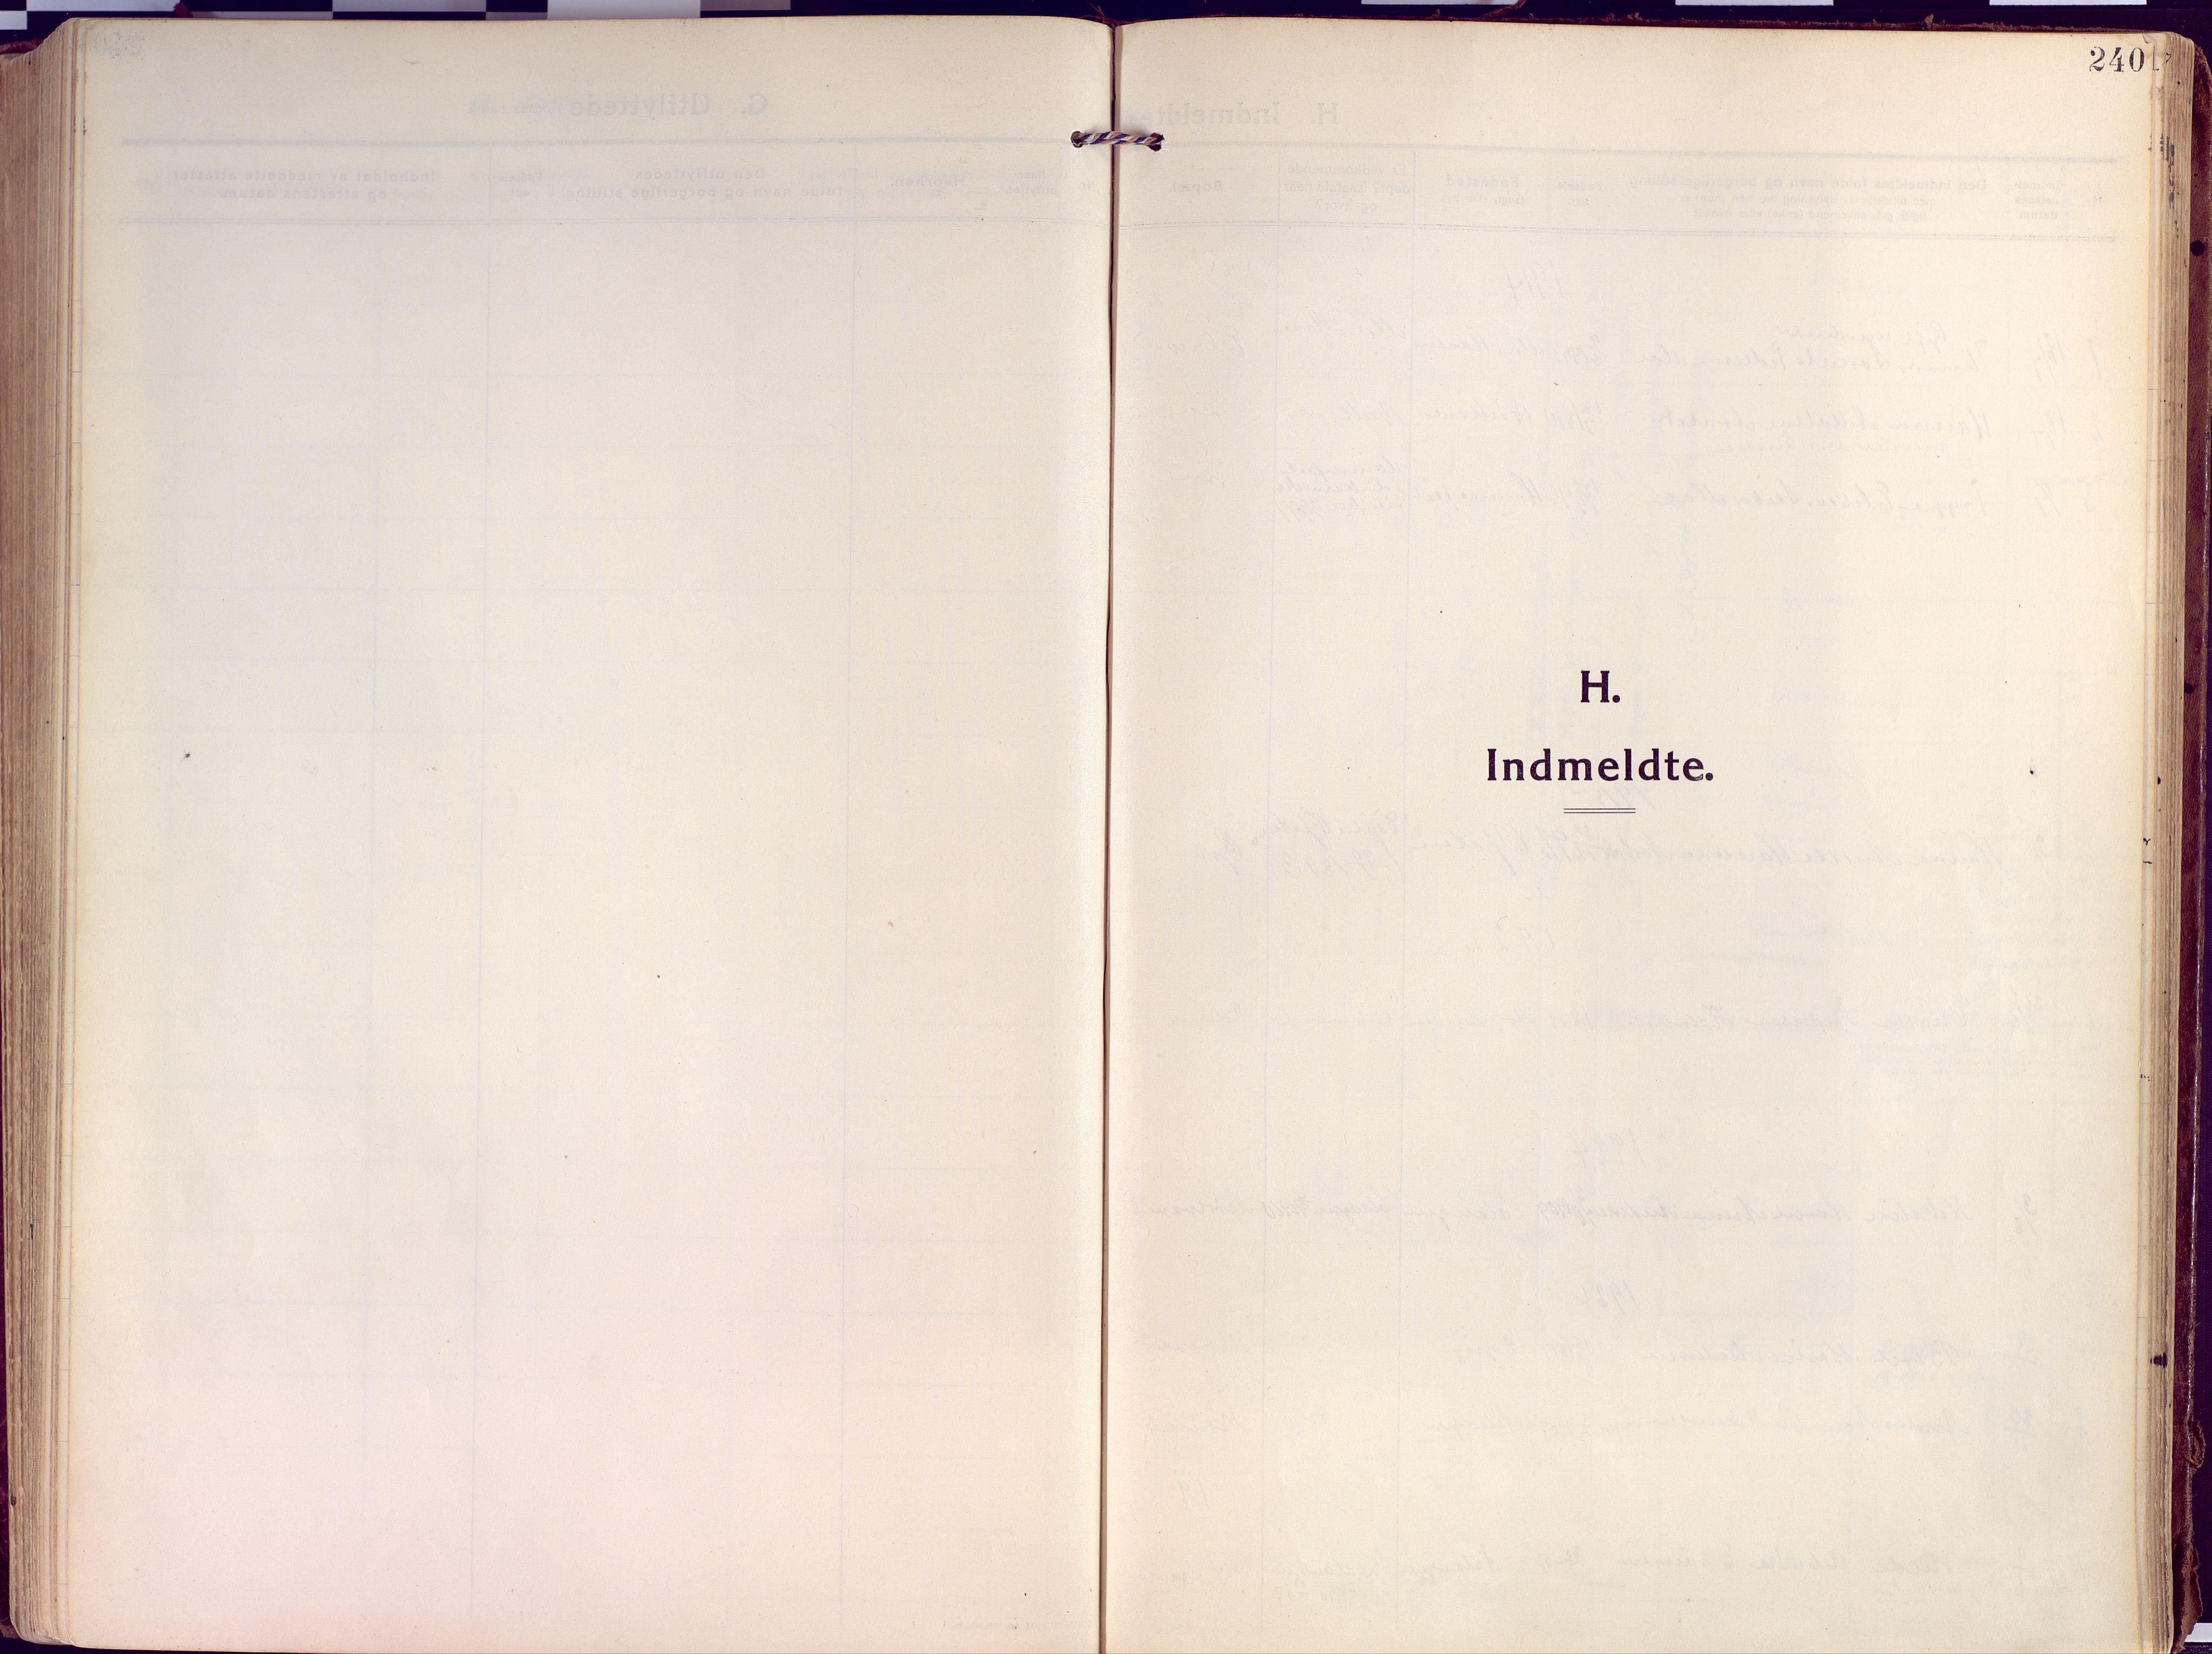 SATØ, Salangen sokneprestembete, Ministerialbok nr. 4, 1912-1927, s. 240